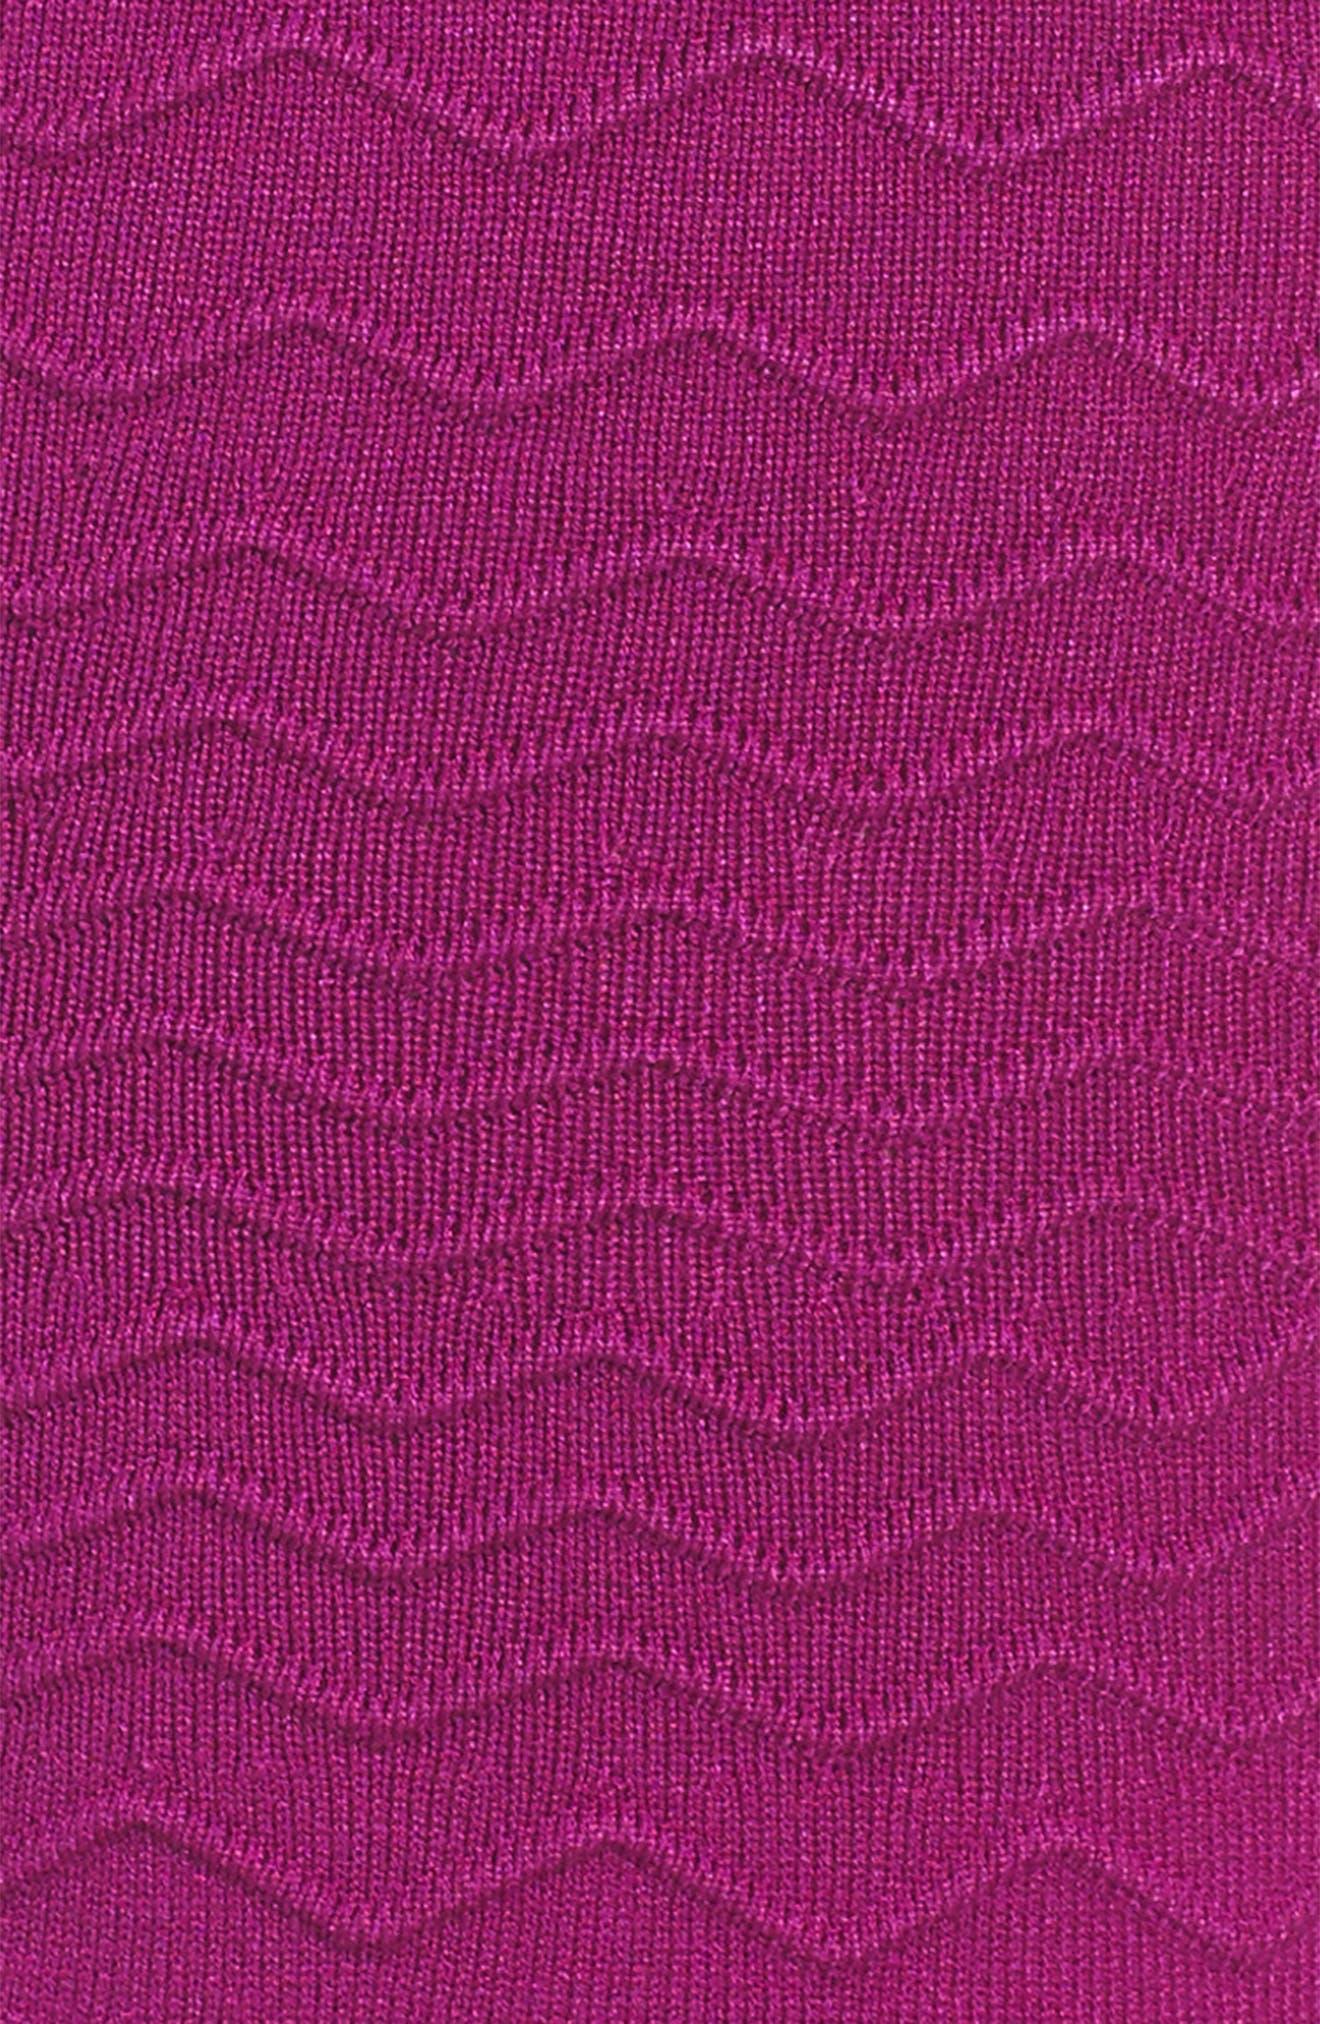 Chevron Ottoman Fit & Flare Dress,                             Alternate thumbnail 3, color,                             Amethyst